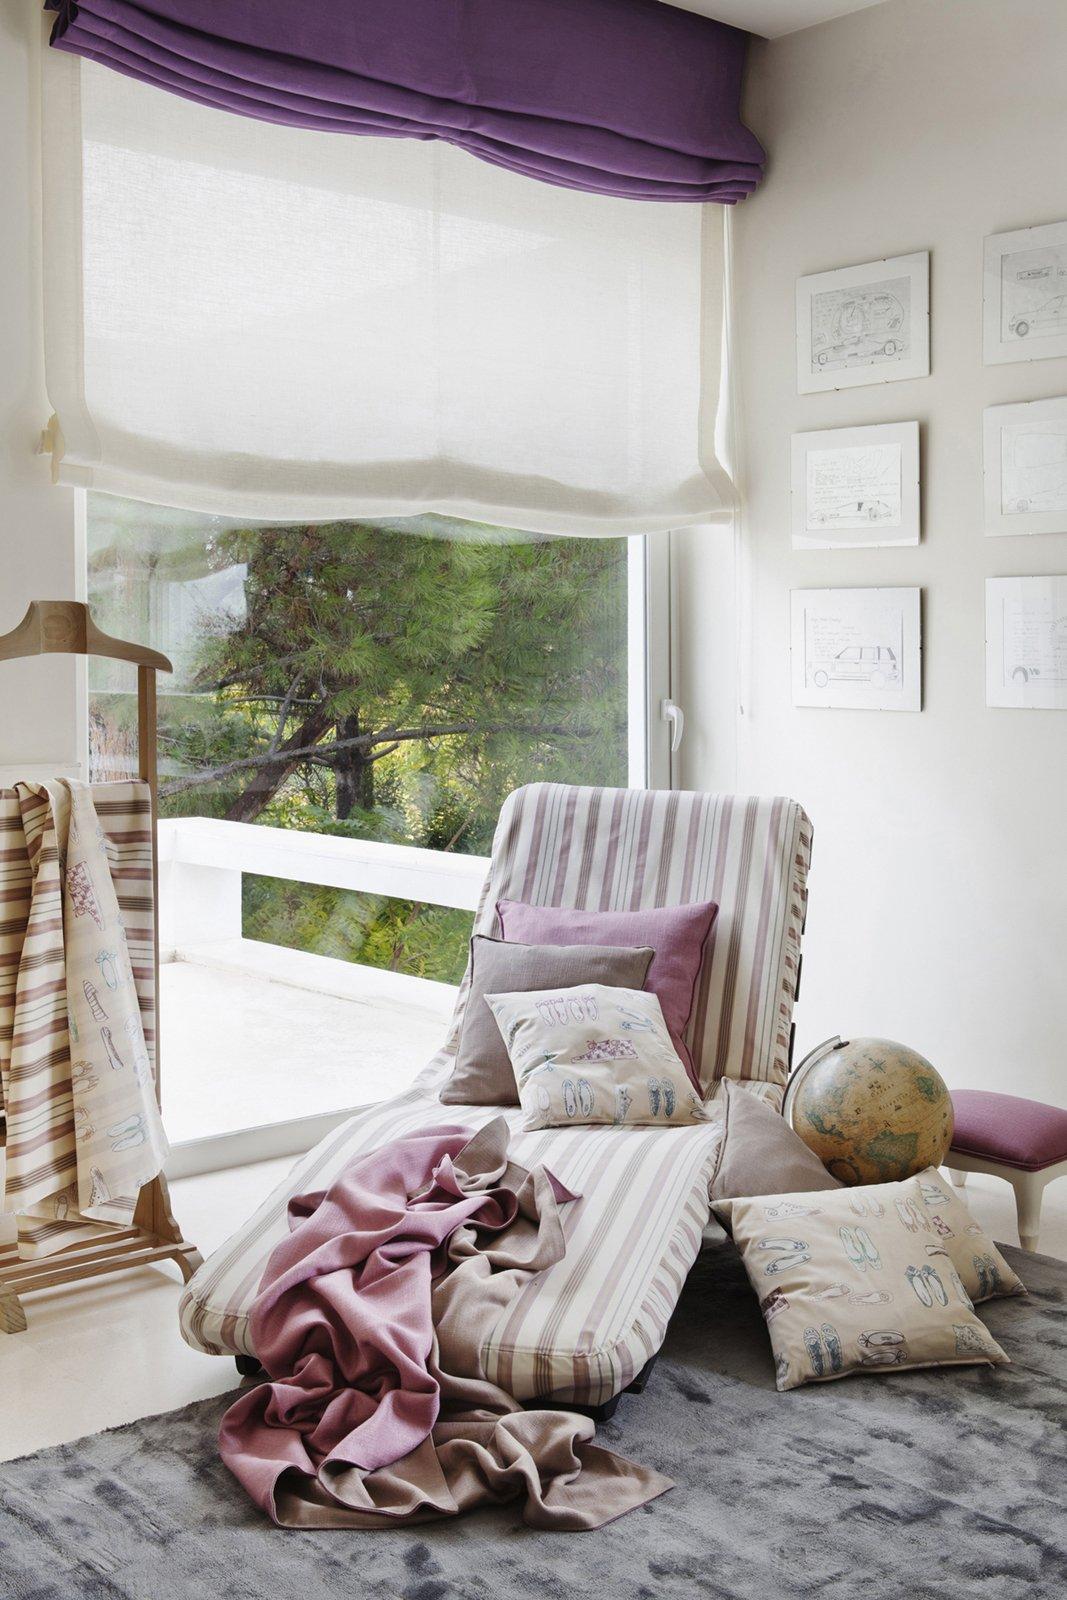 Tipi Di Tende Per Casa le tende a pacchetto - cose di casa